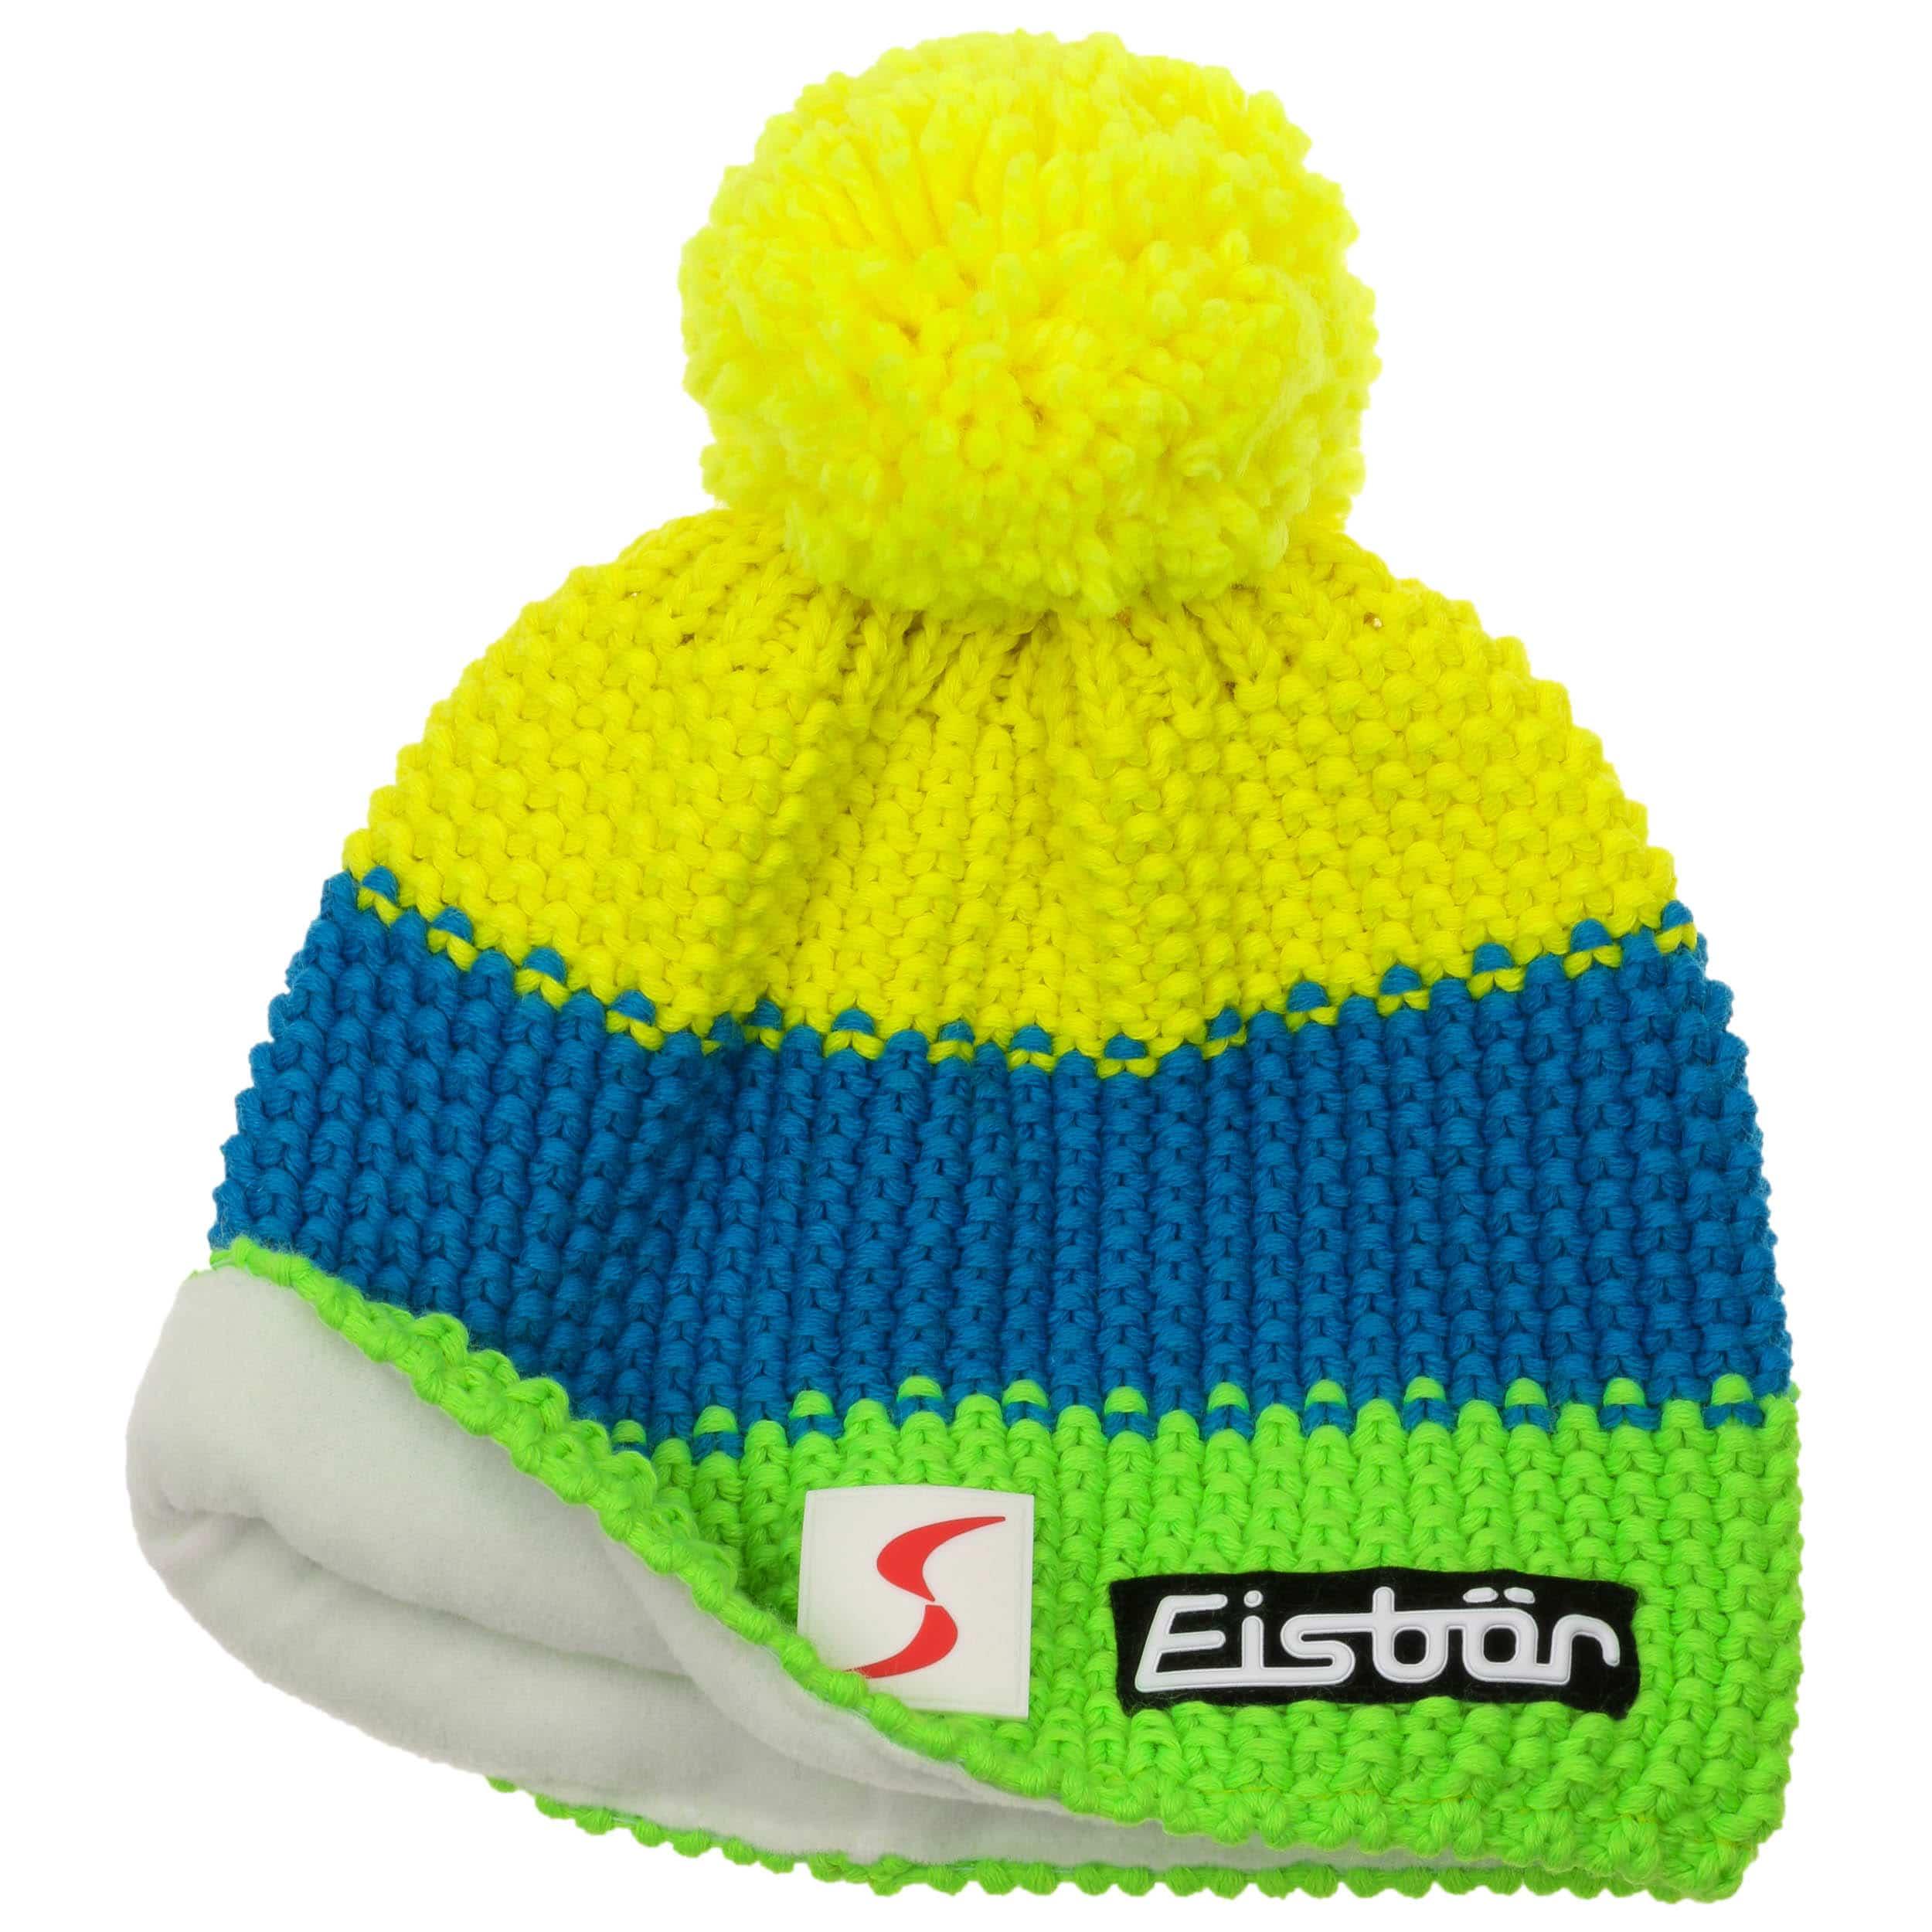 ... Star Neon Bobble Hat by Eisbär - royal-blue 1 ... eb7929686eaa